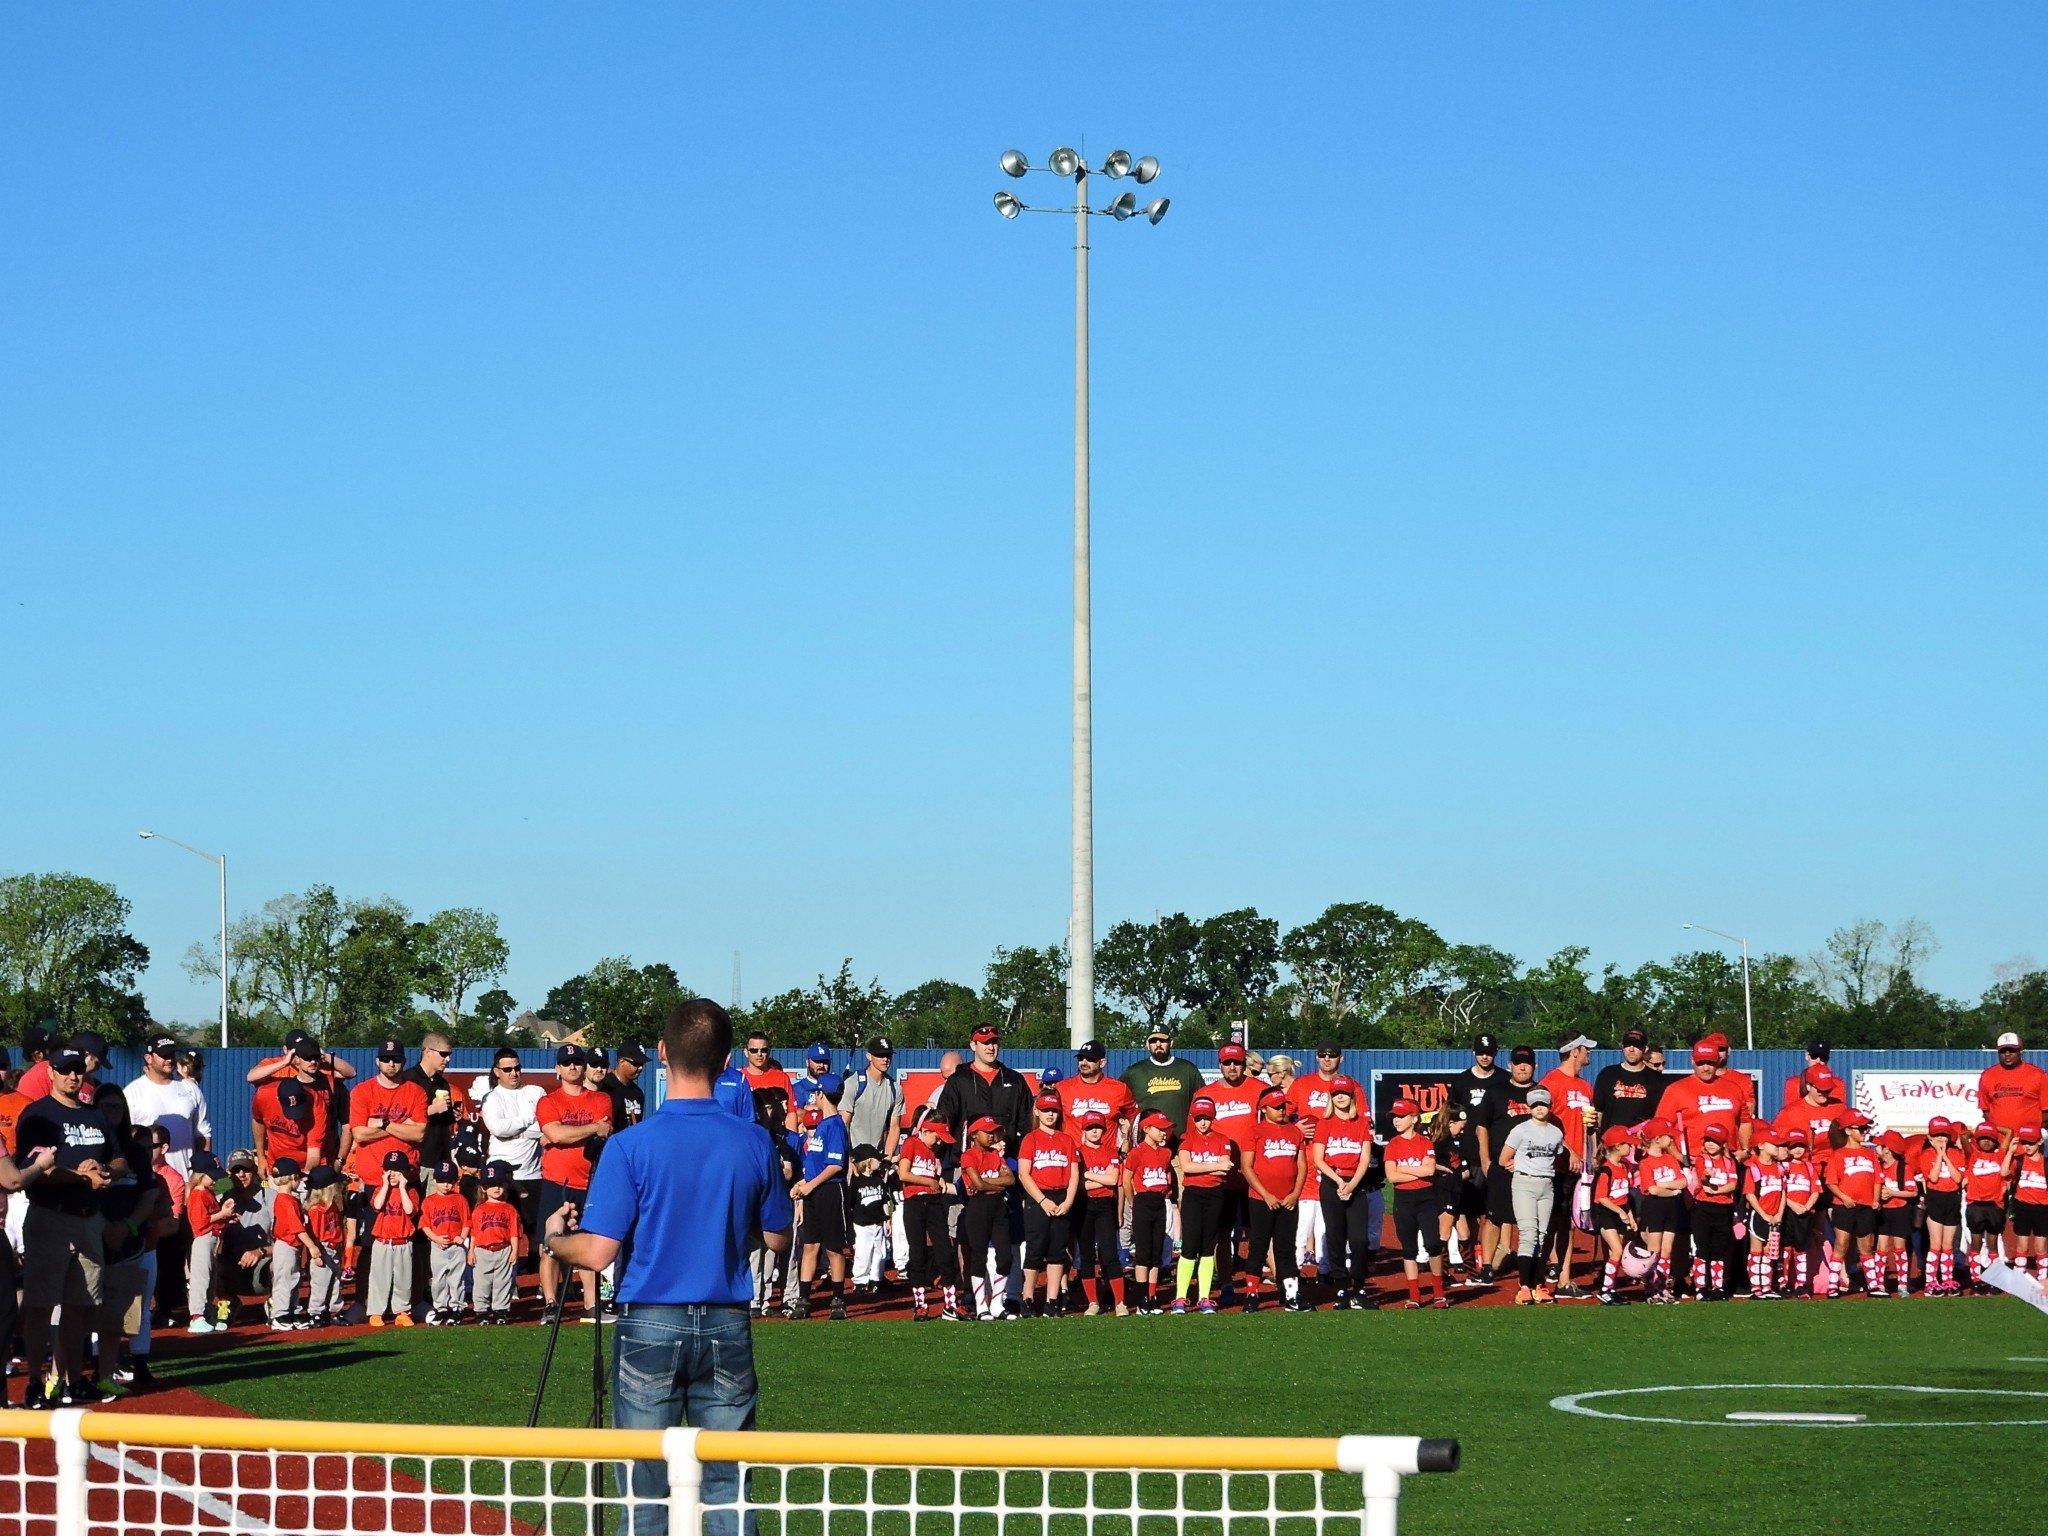 Baseball Day, 2016, Mayor Ken Ritter welcoming the teams